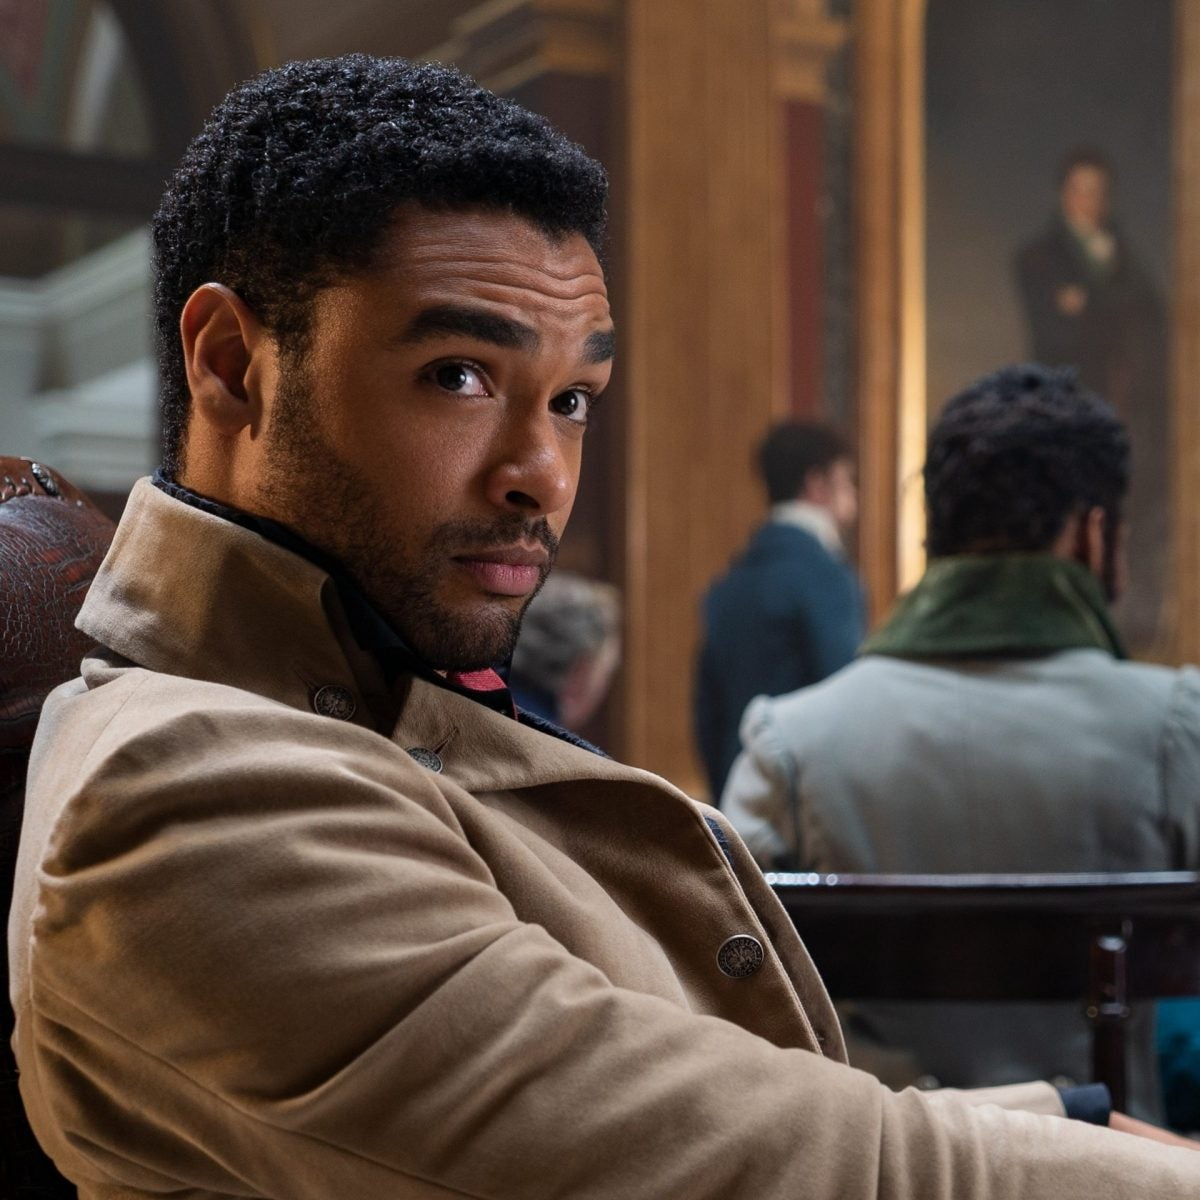 Netflix Confirms Rege-Jean Page Will Not Return For Season 2 of 'Bridgerton'